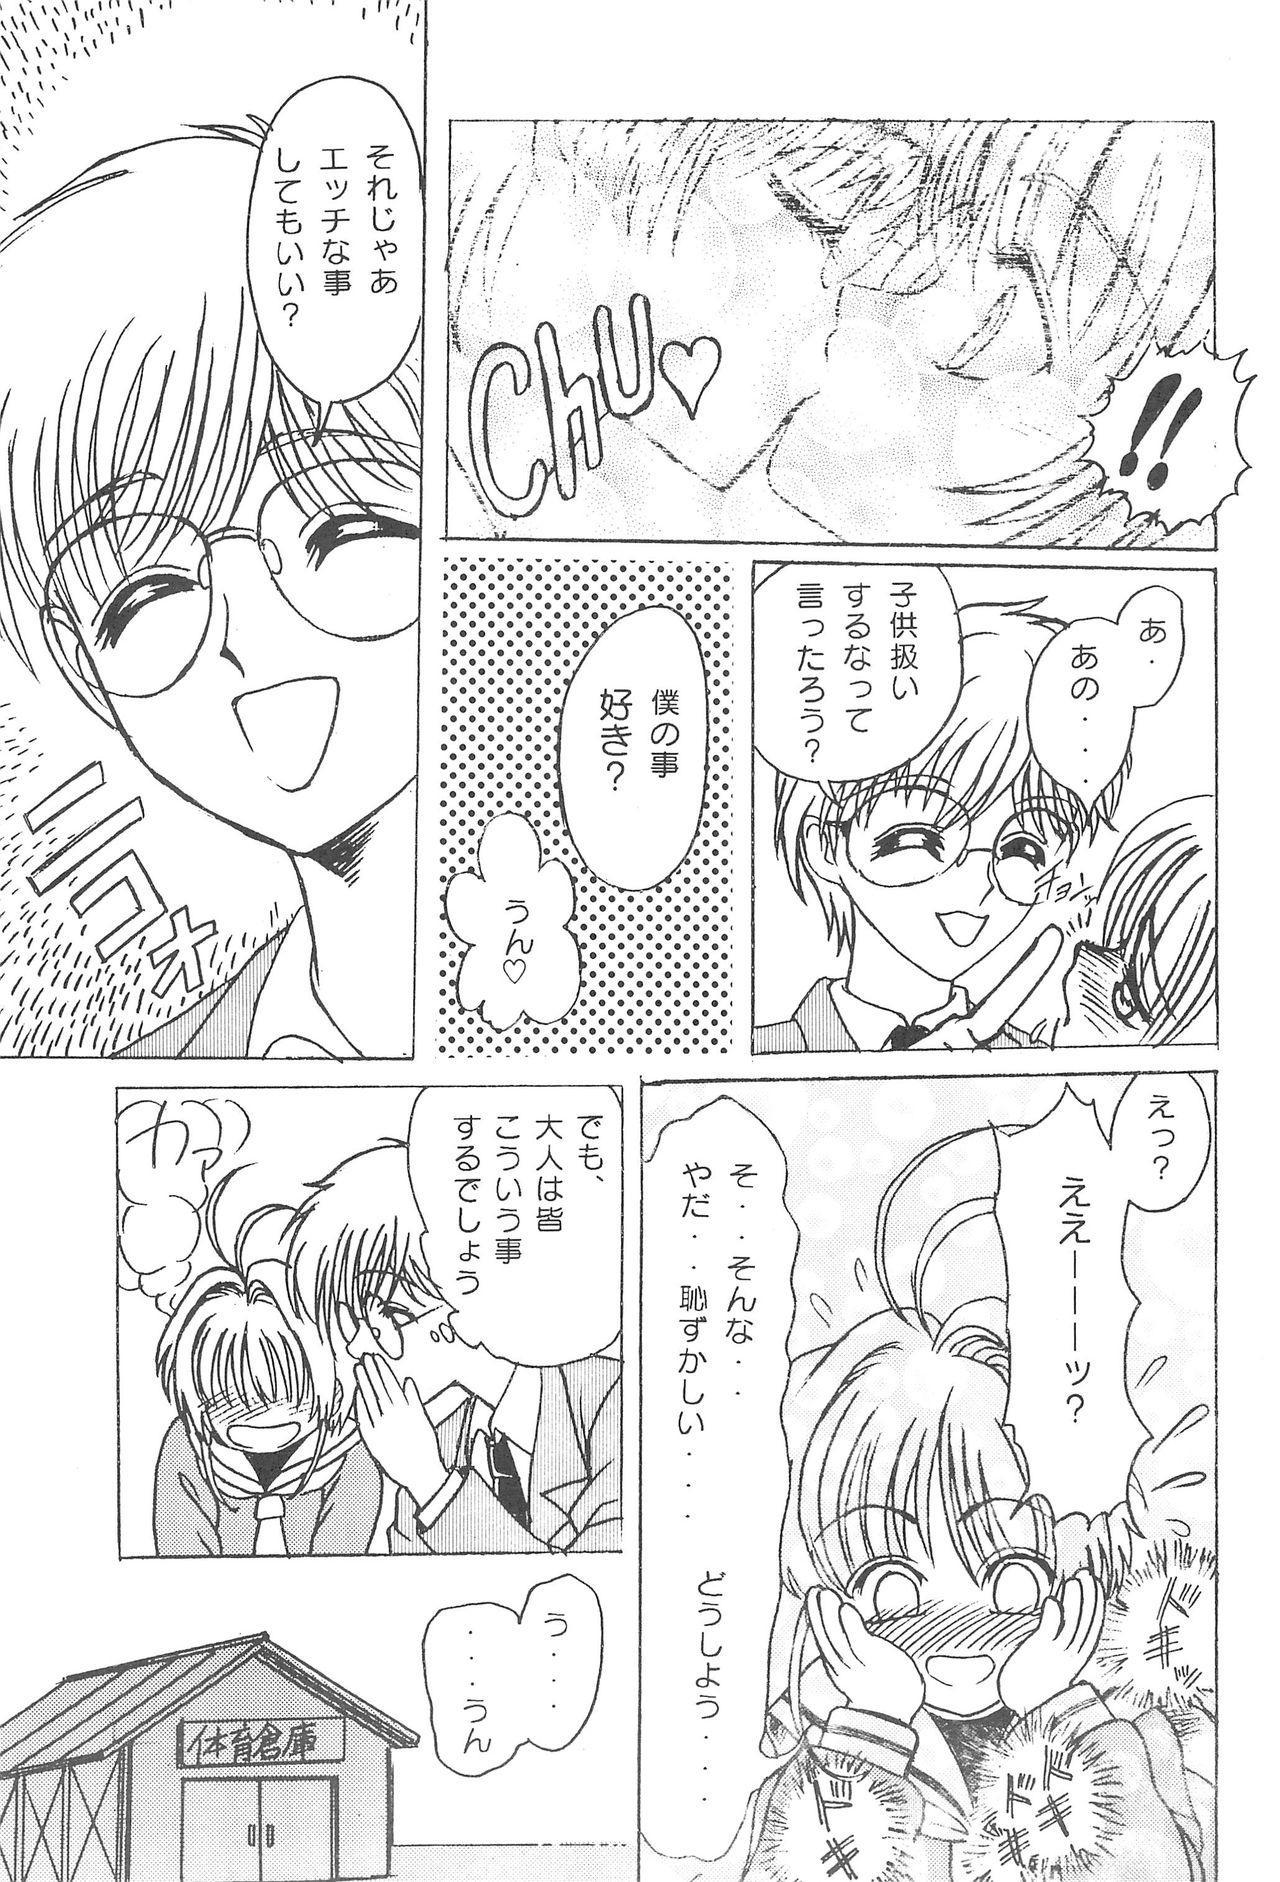 Kero-chan to Issho 6